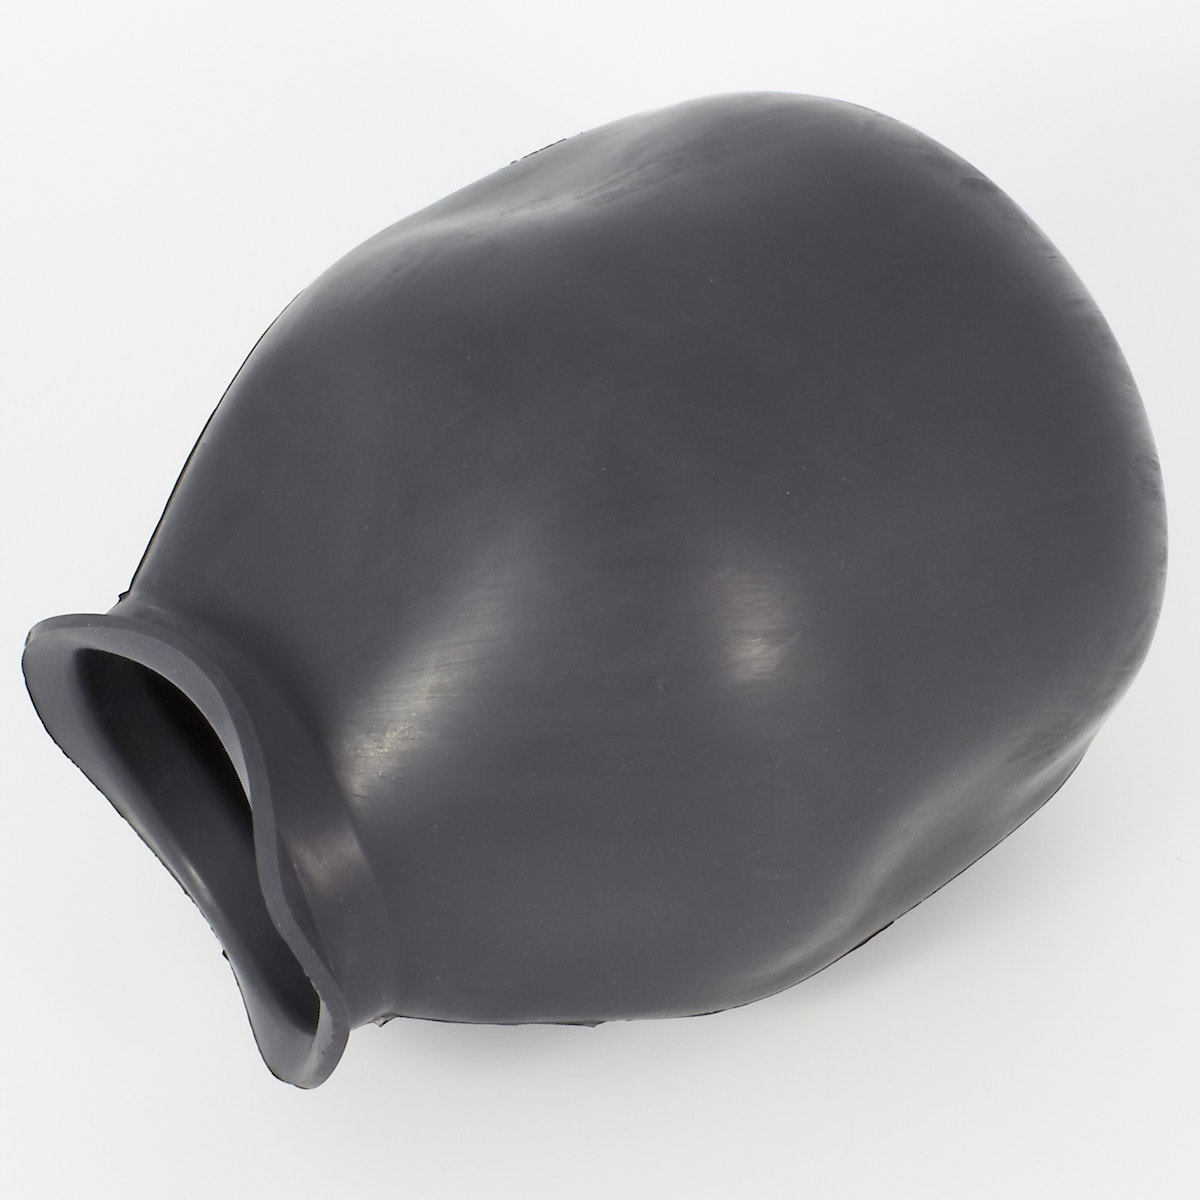 Gummibelg Cotech